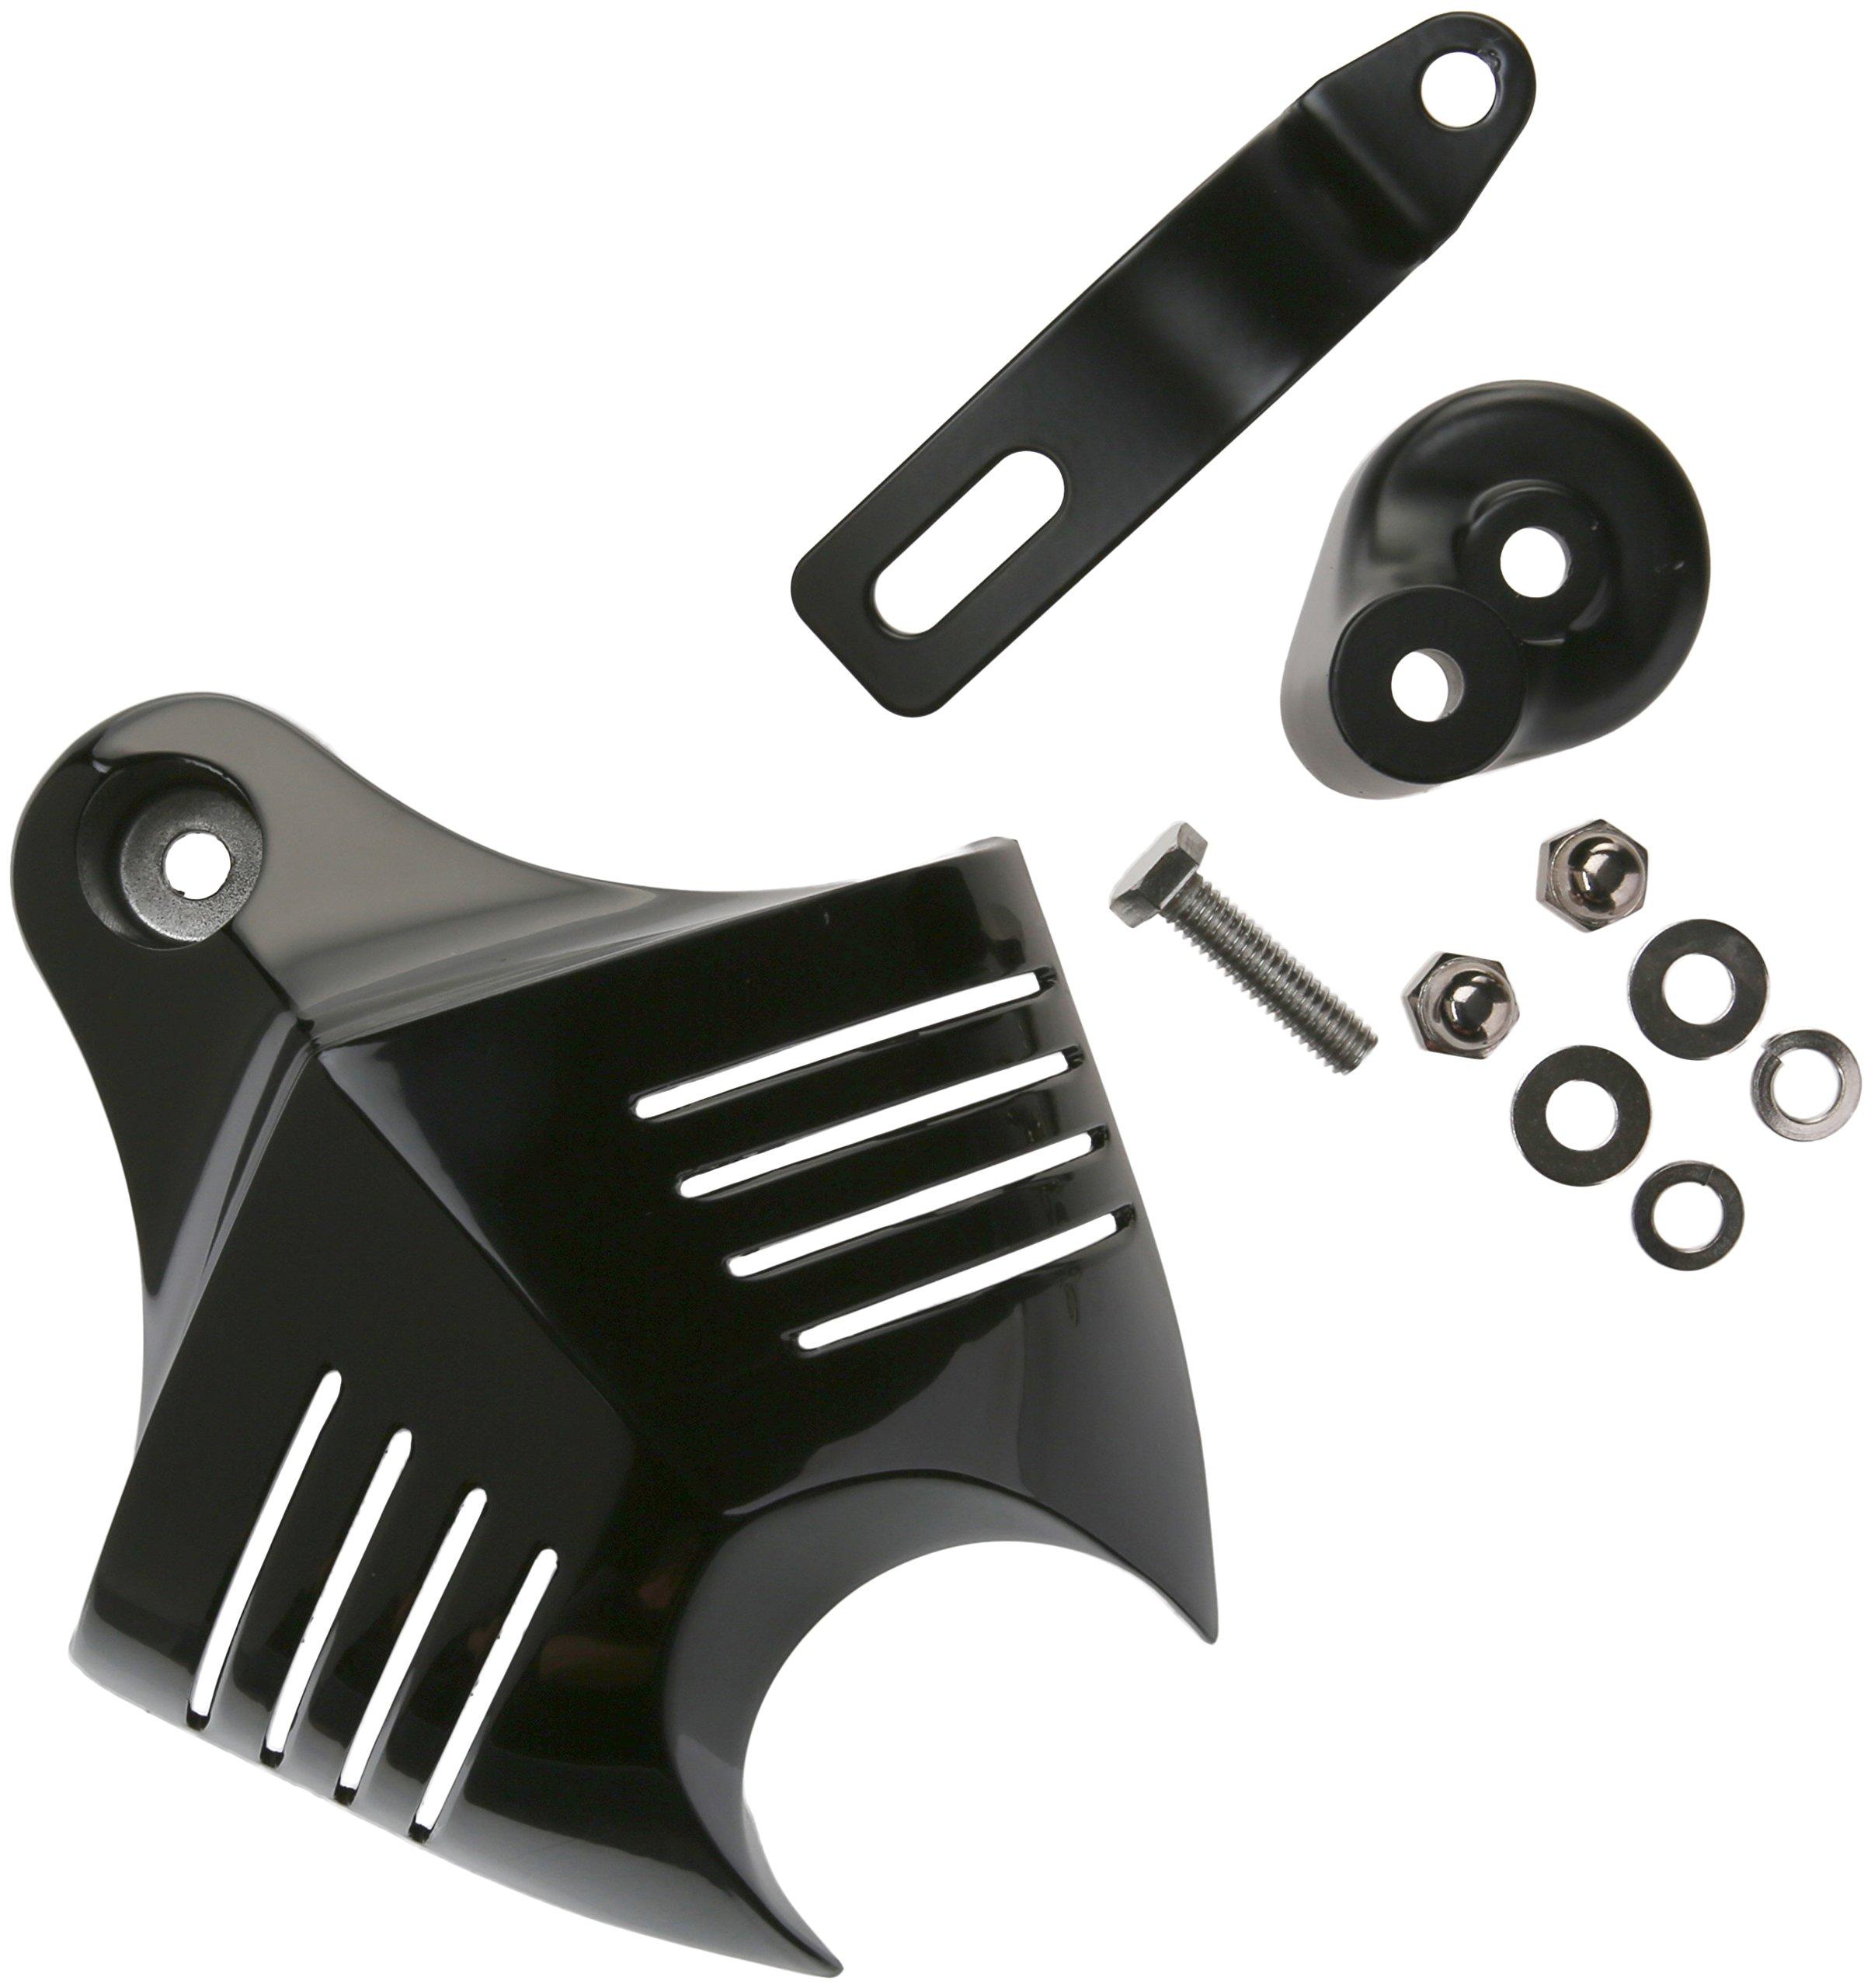 Kuryakyn 7204 Black V-Shield Horn Cover